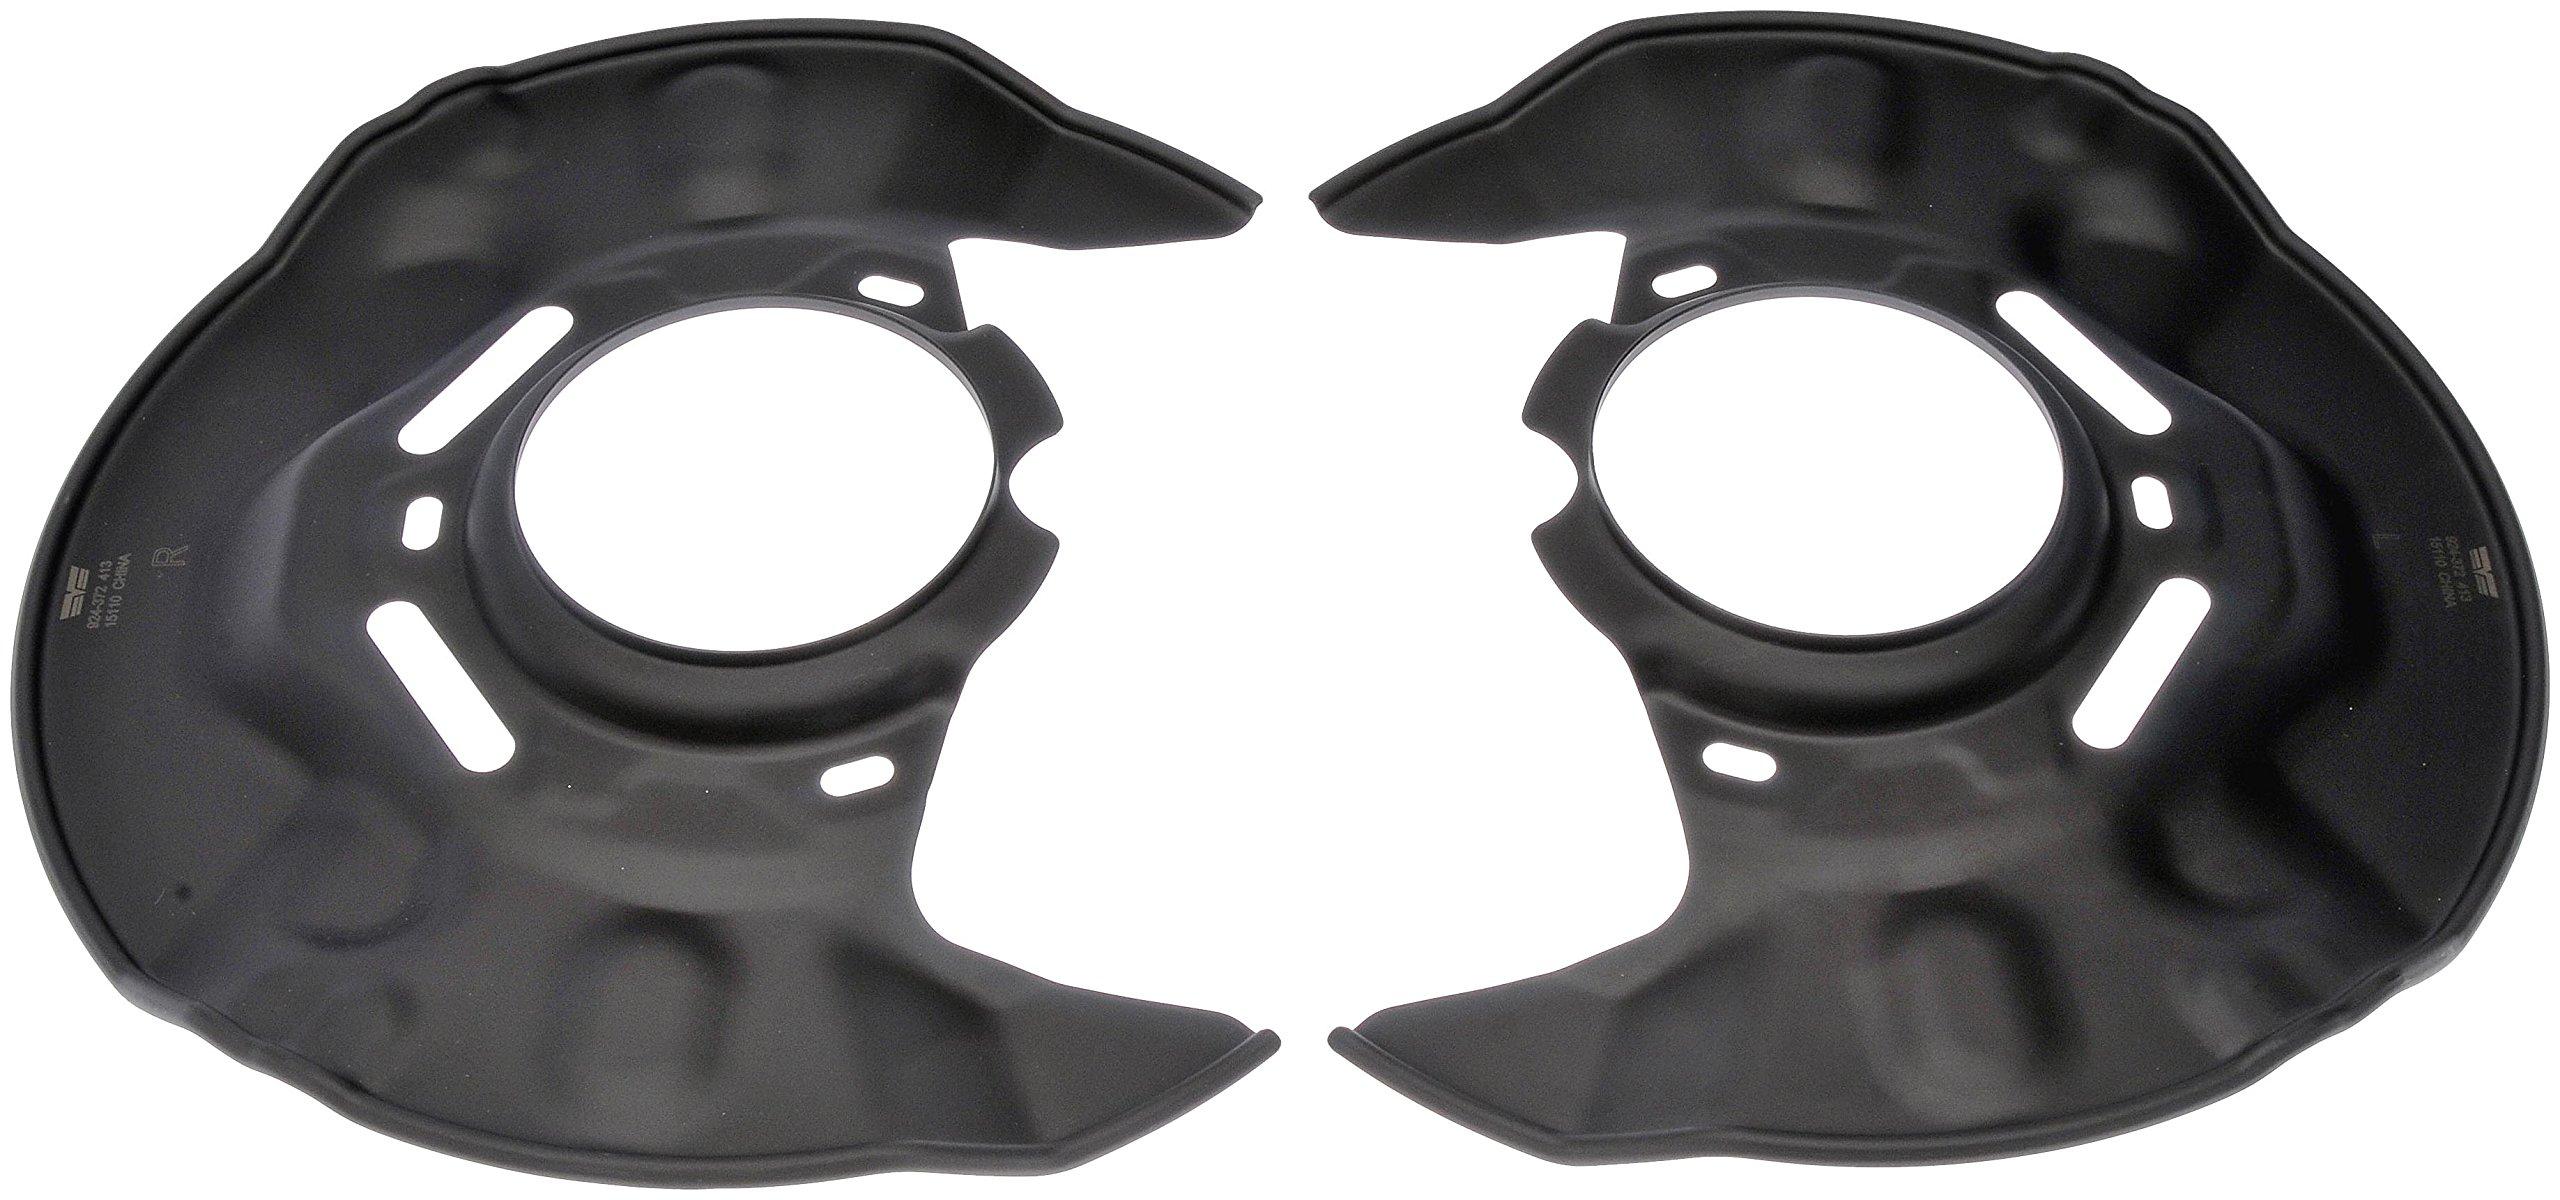 Dorman 924-372 Brake Dust Shield, Pair by Dorman